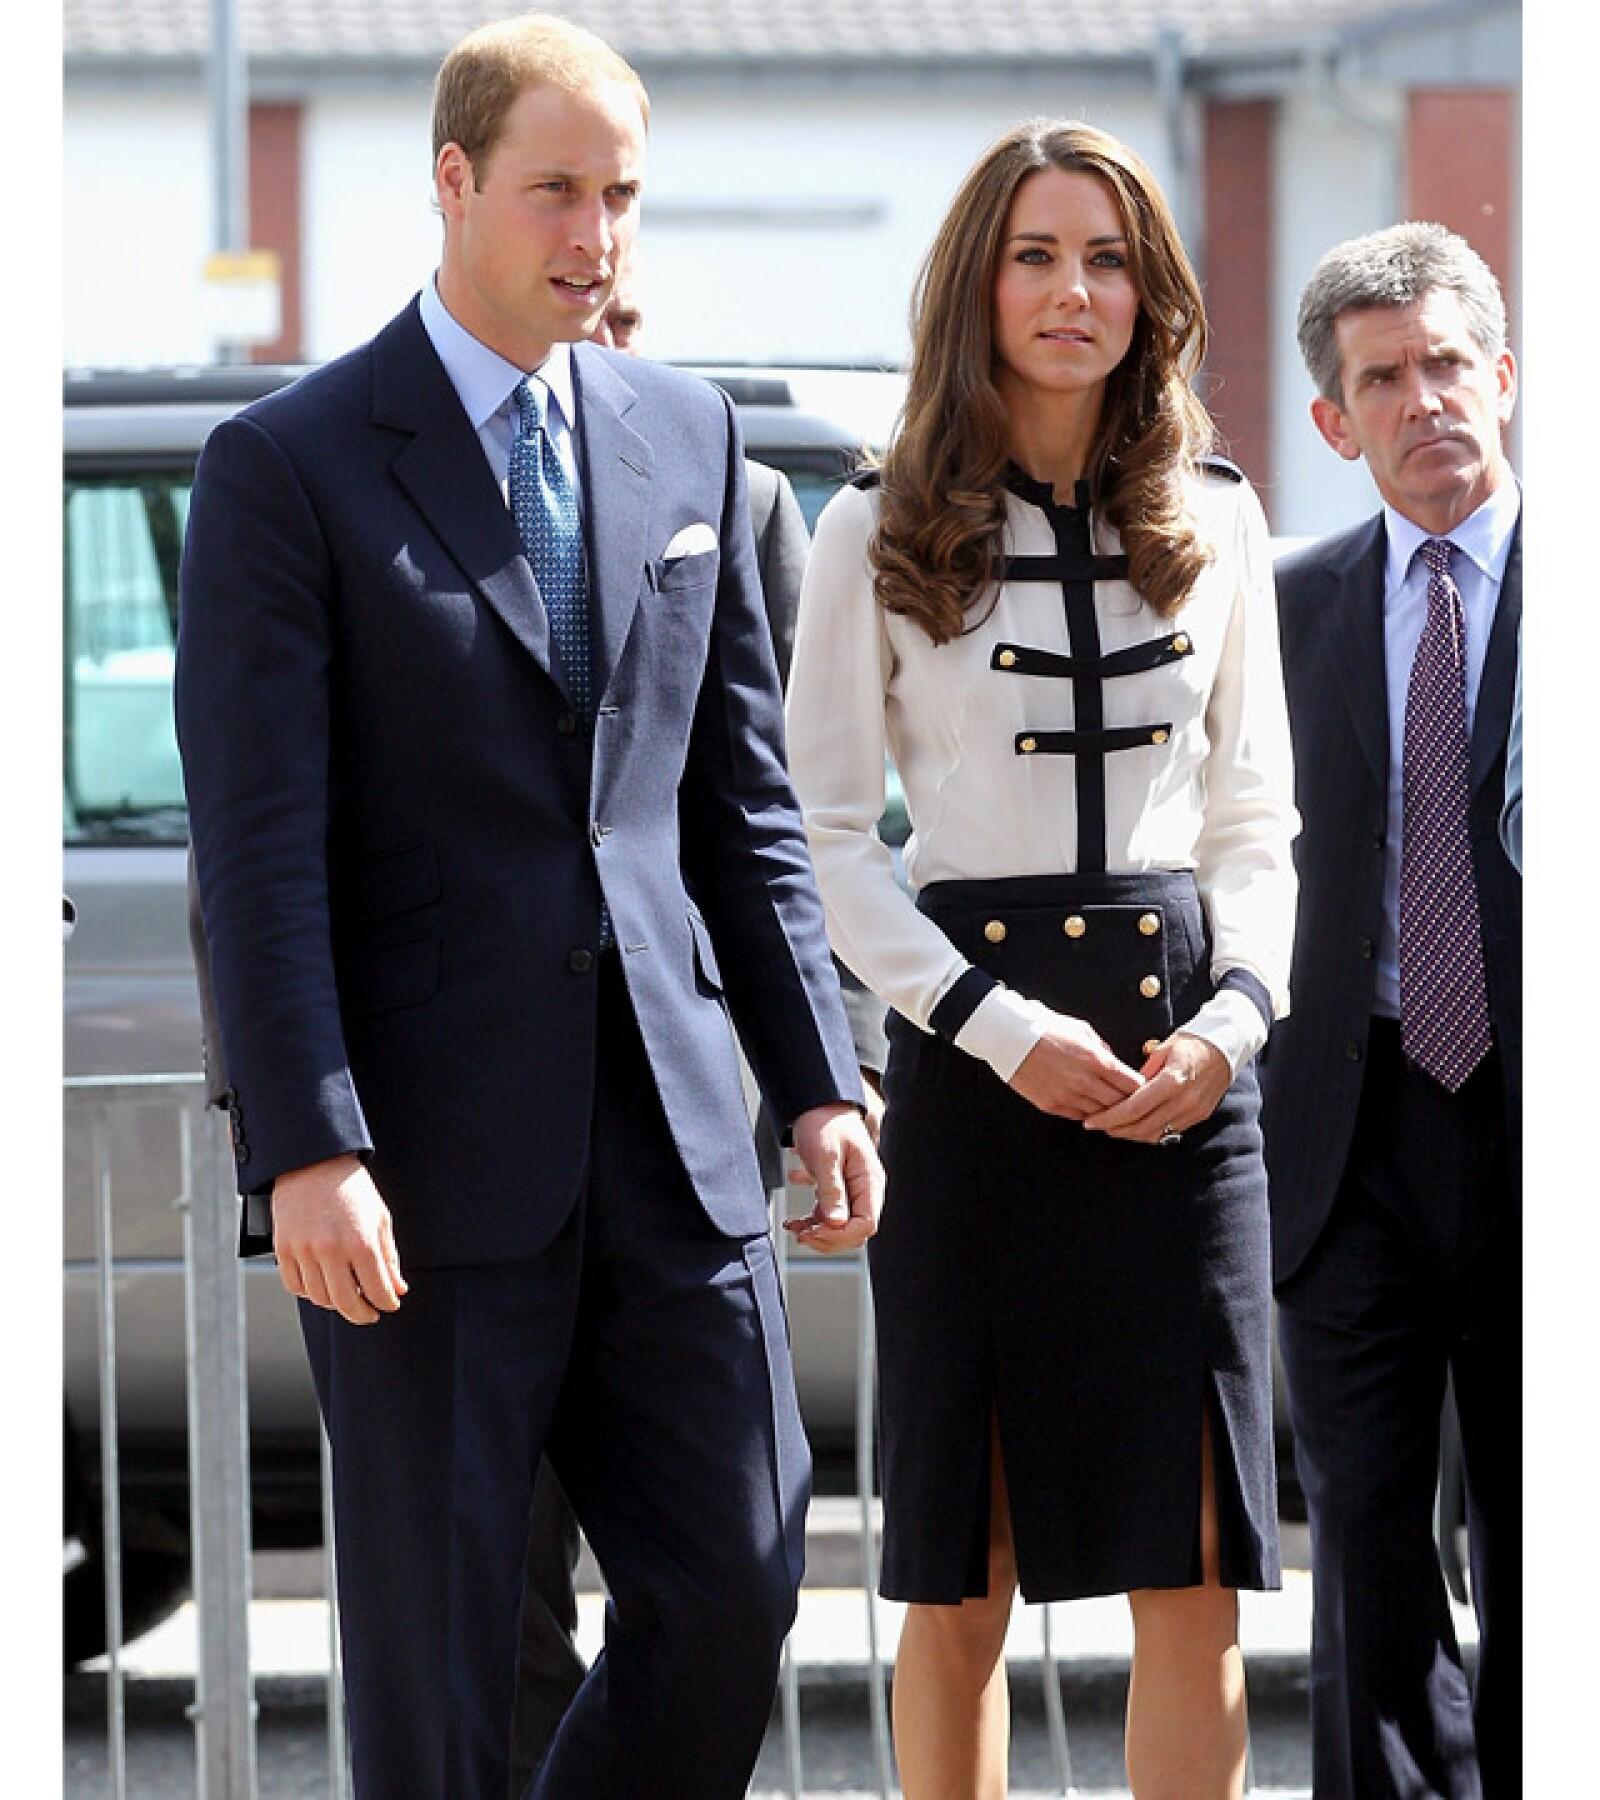 Kate lució un atuendo de inspiración marítima en un acto oficial junto al príncipe Guillermo.